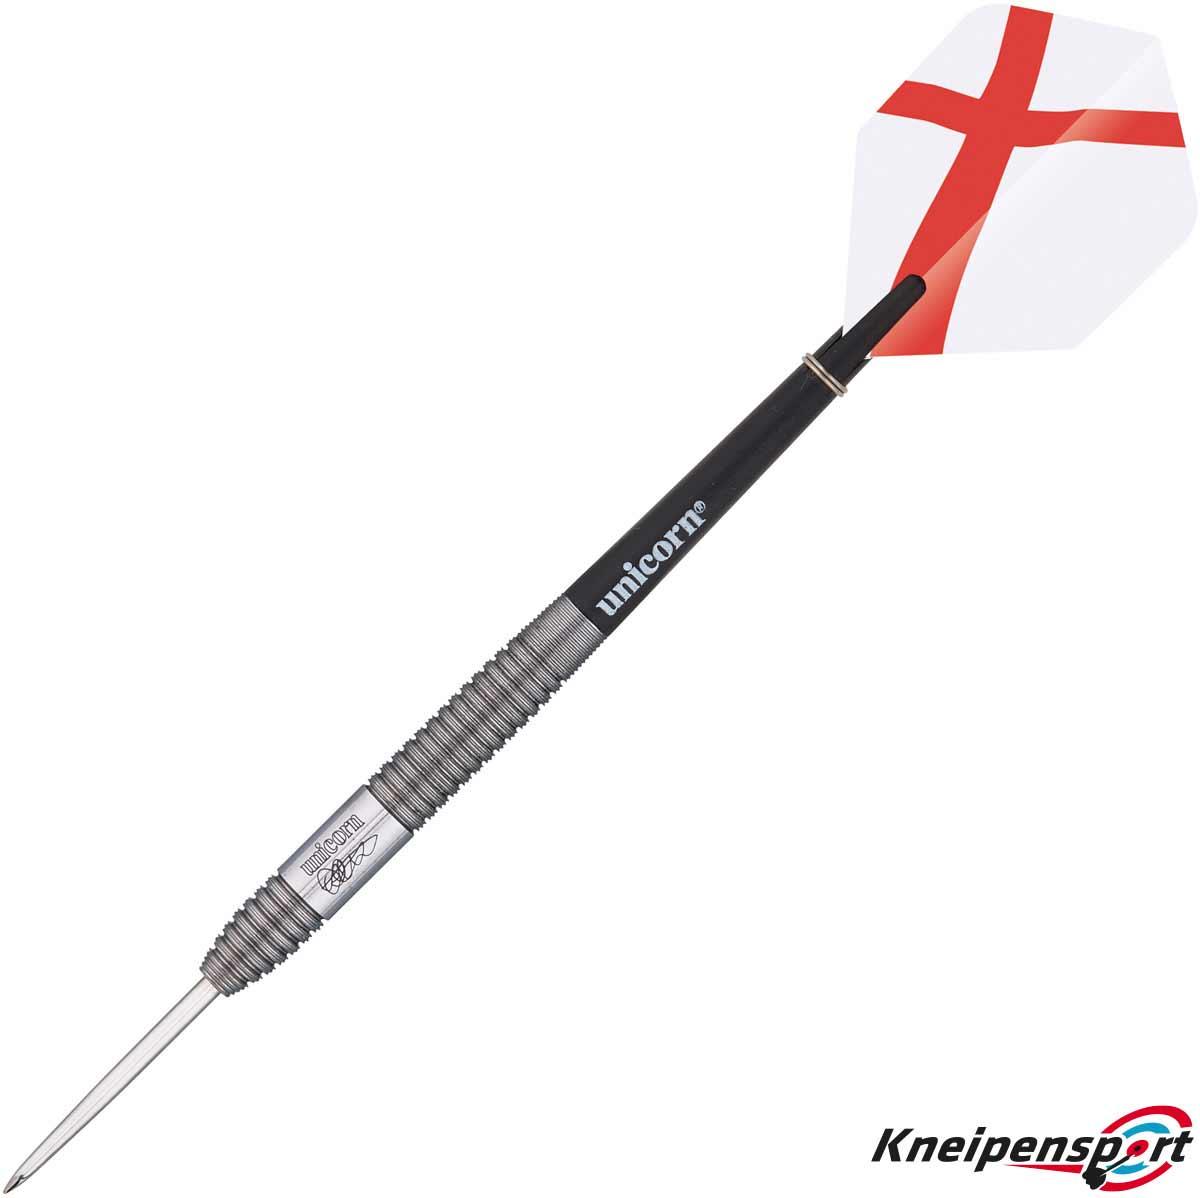 Unicorn Generation 180 Craig Reeves Steel Dart 25g silber 07570 Featured 1